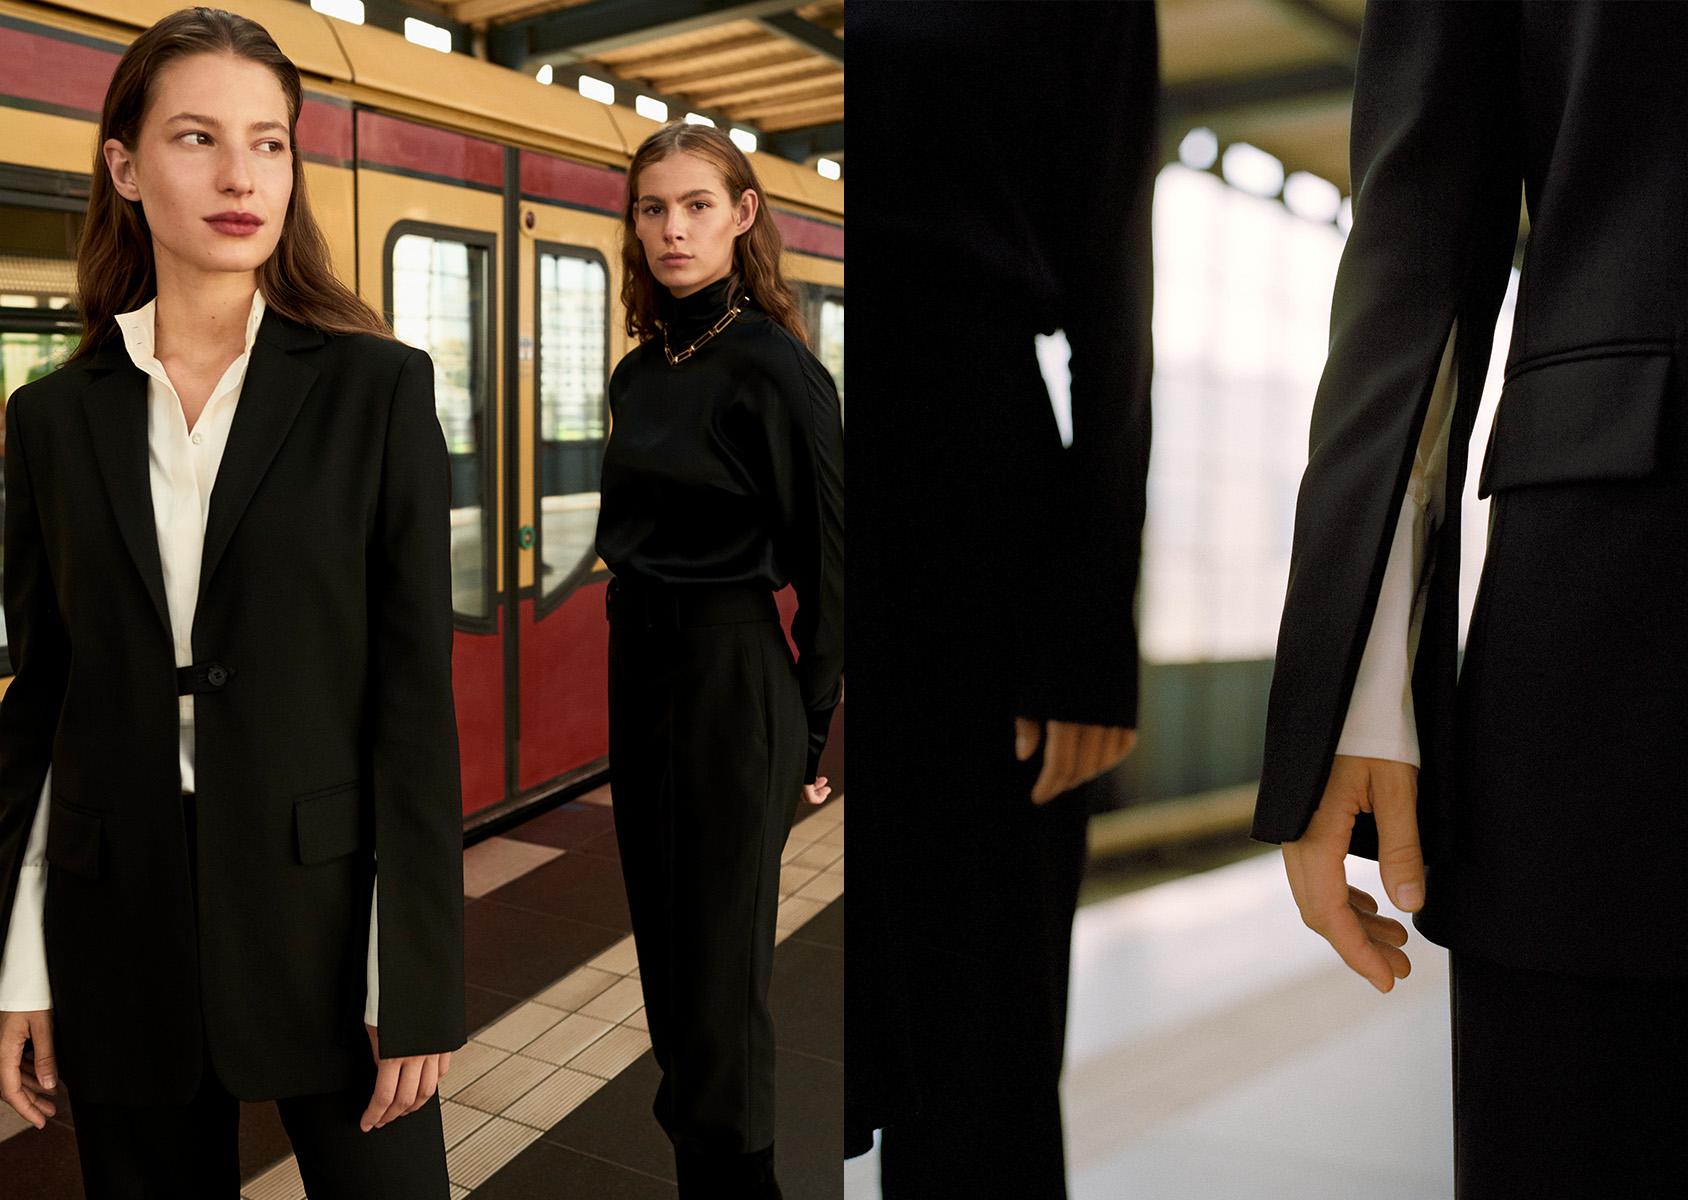 H&M blazer with slit sleeves